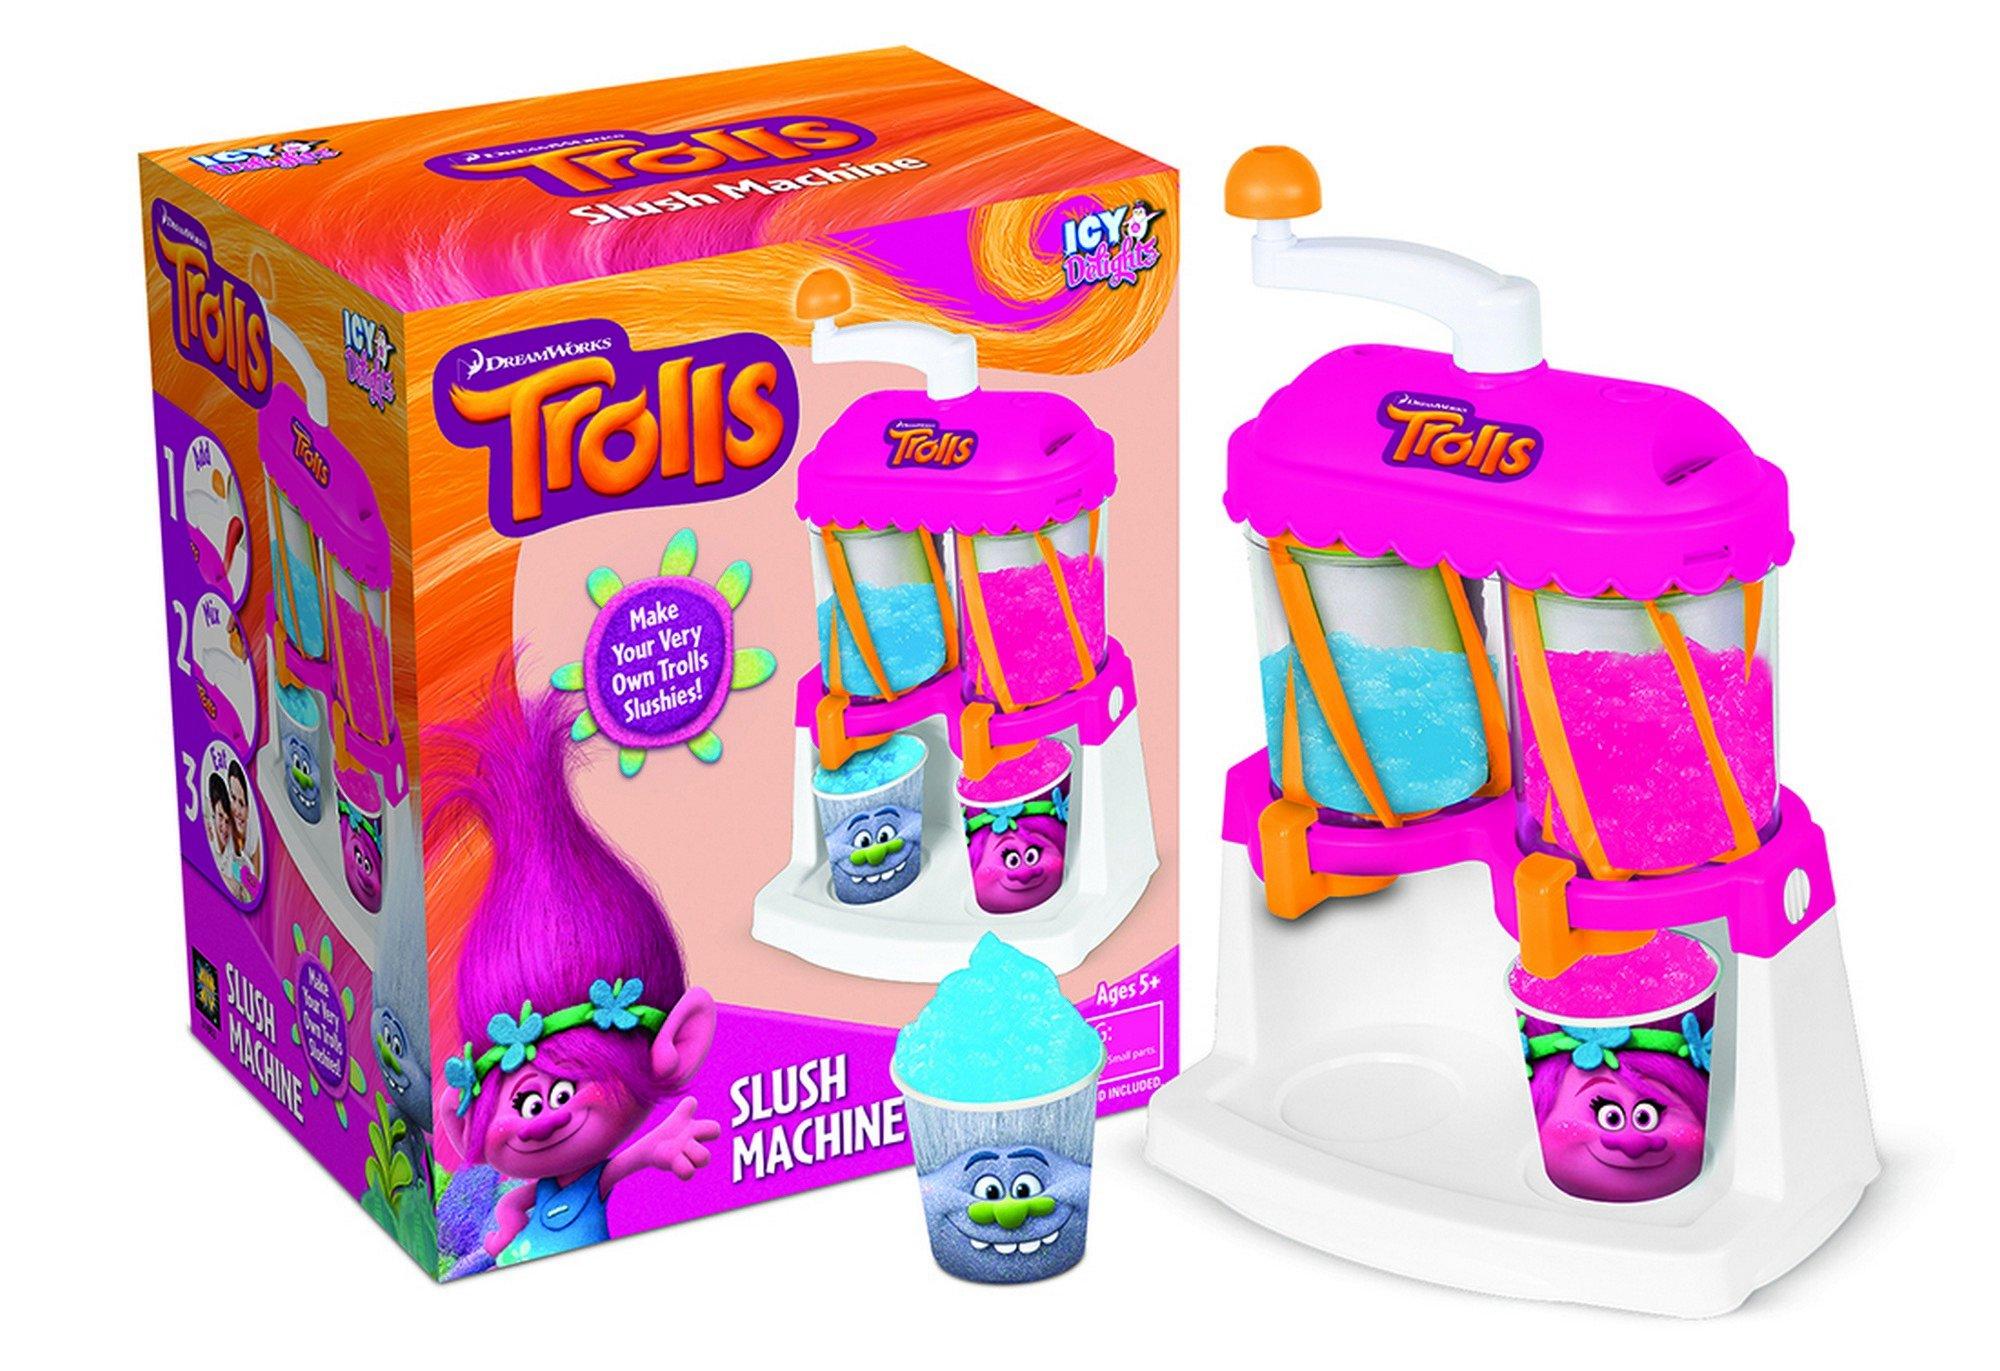 Universal AMAV Toys Trolls Slush Machine DIY Make Your Own Slush Fun Kit for Children by Universal